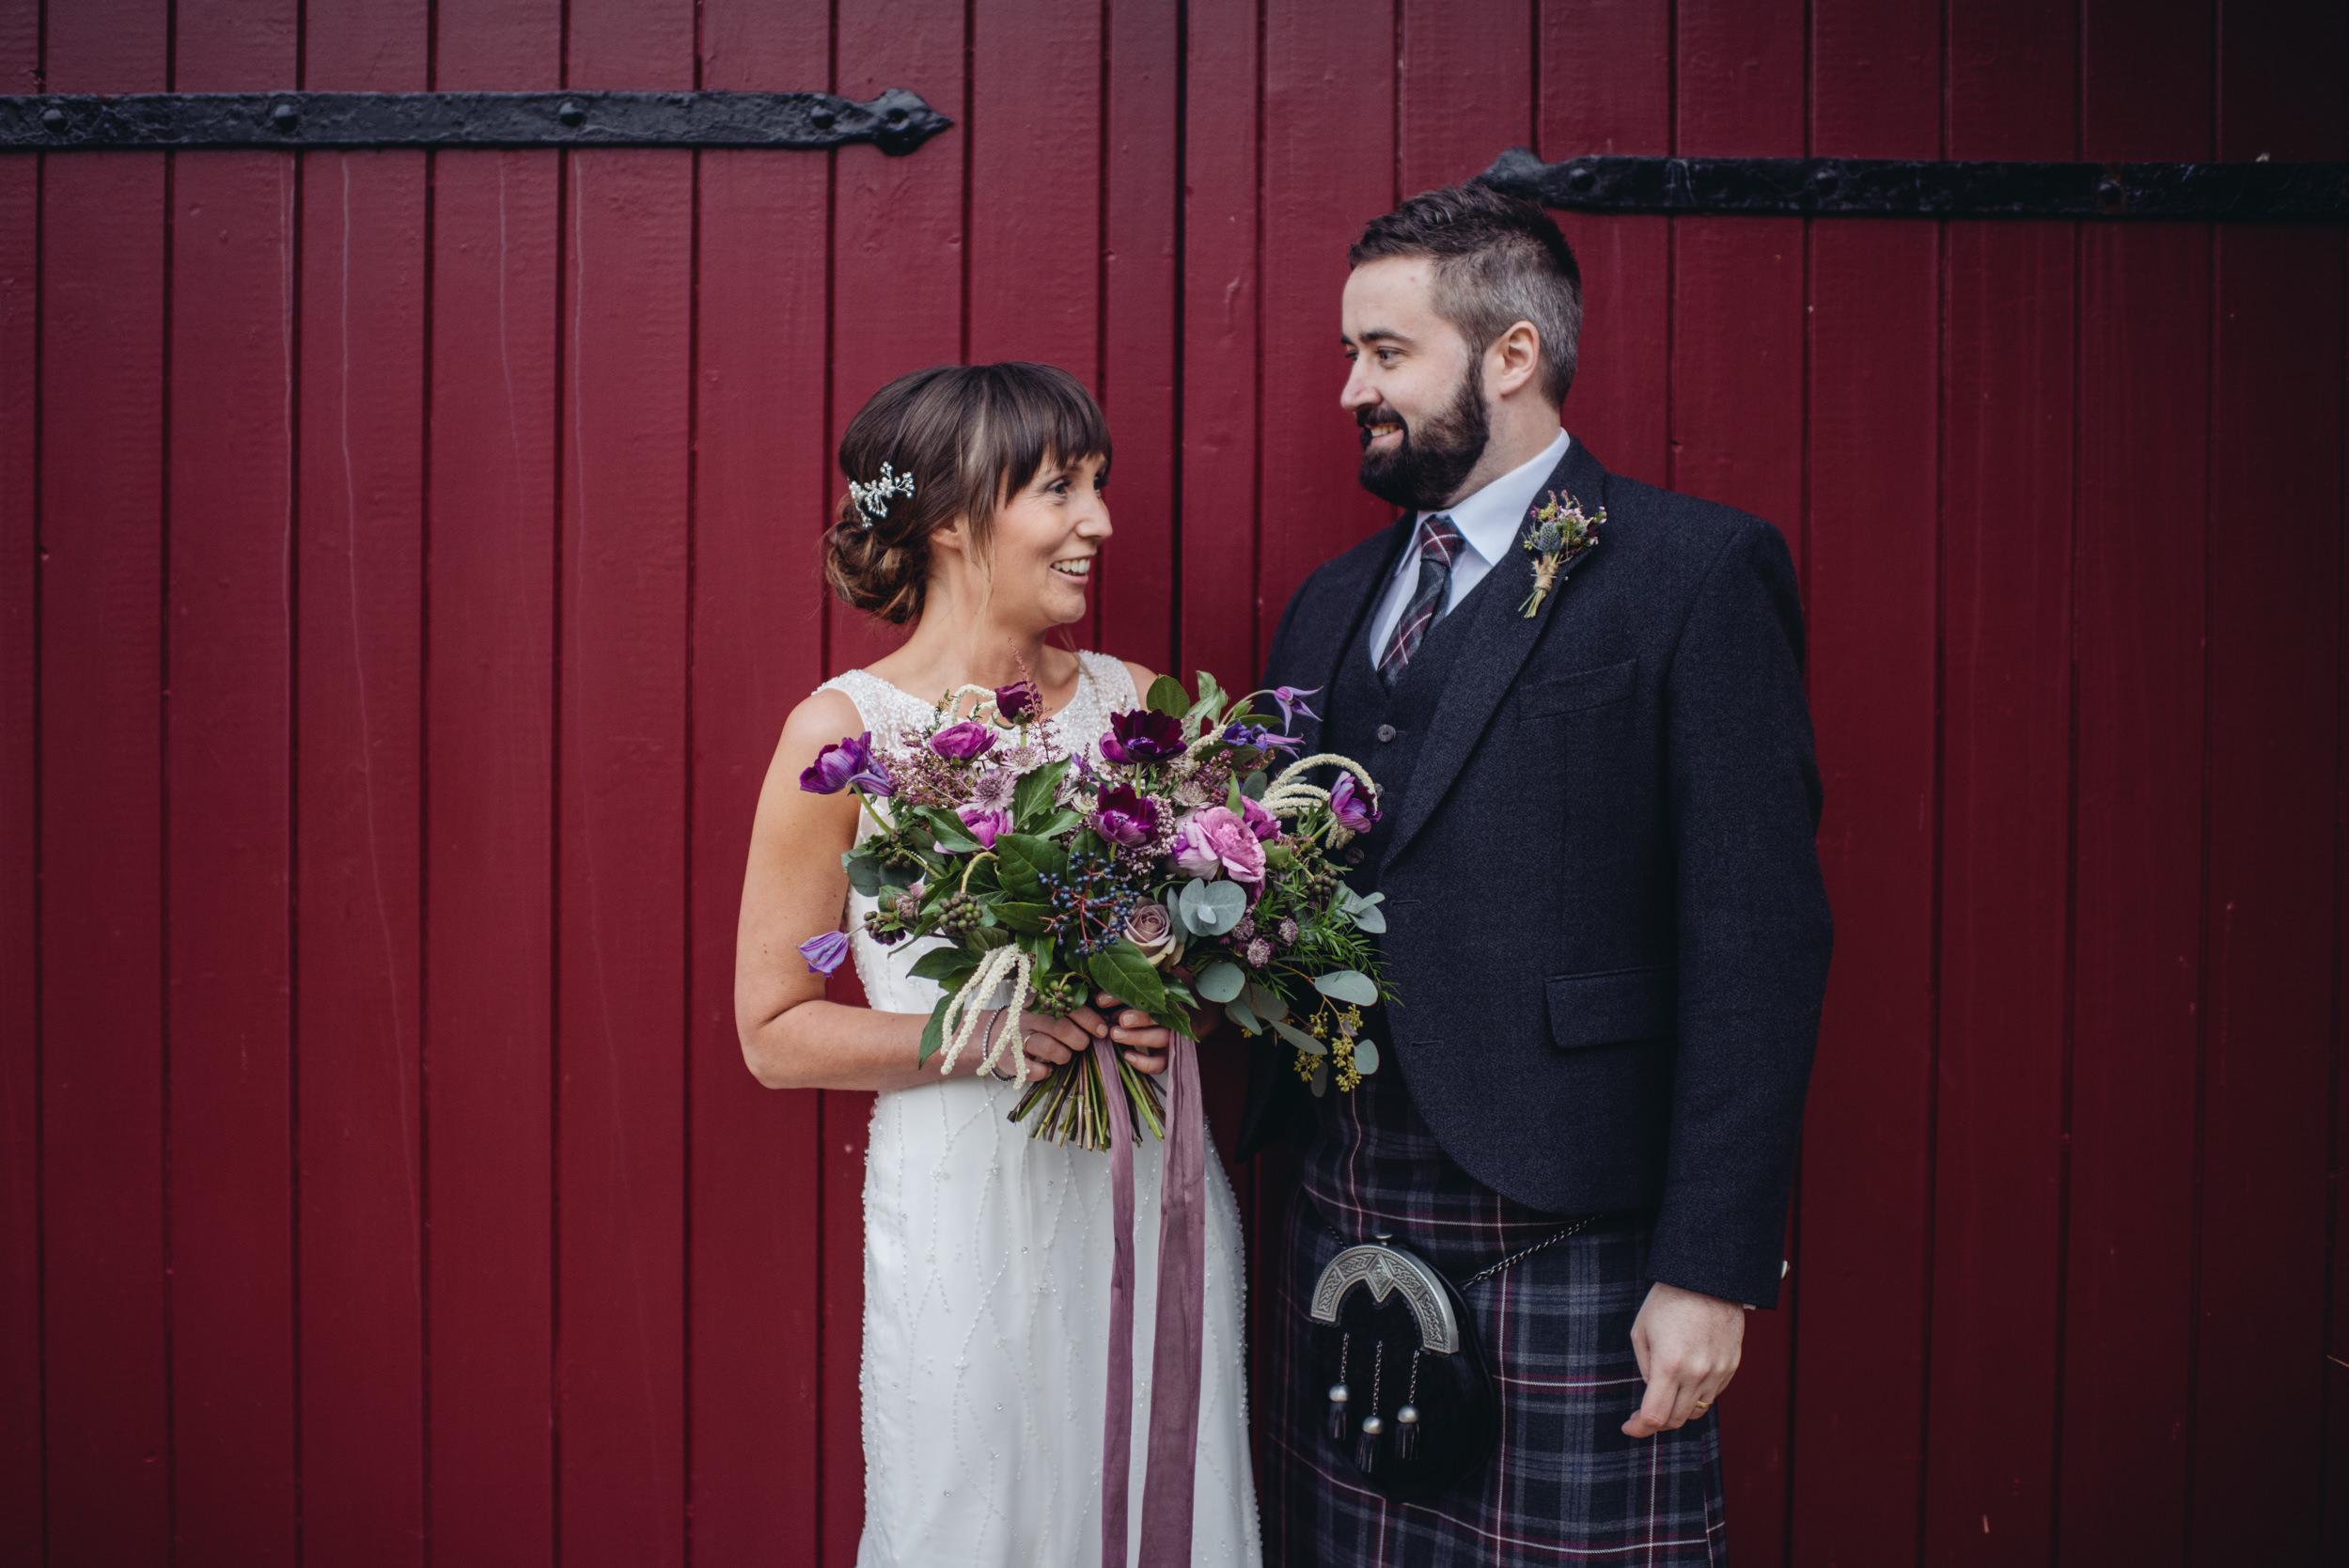 0195-alternative-wedding-portrait-family-kids-photographer-glasgow-scotland.JPG